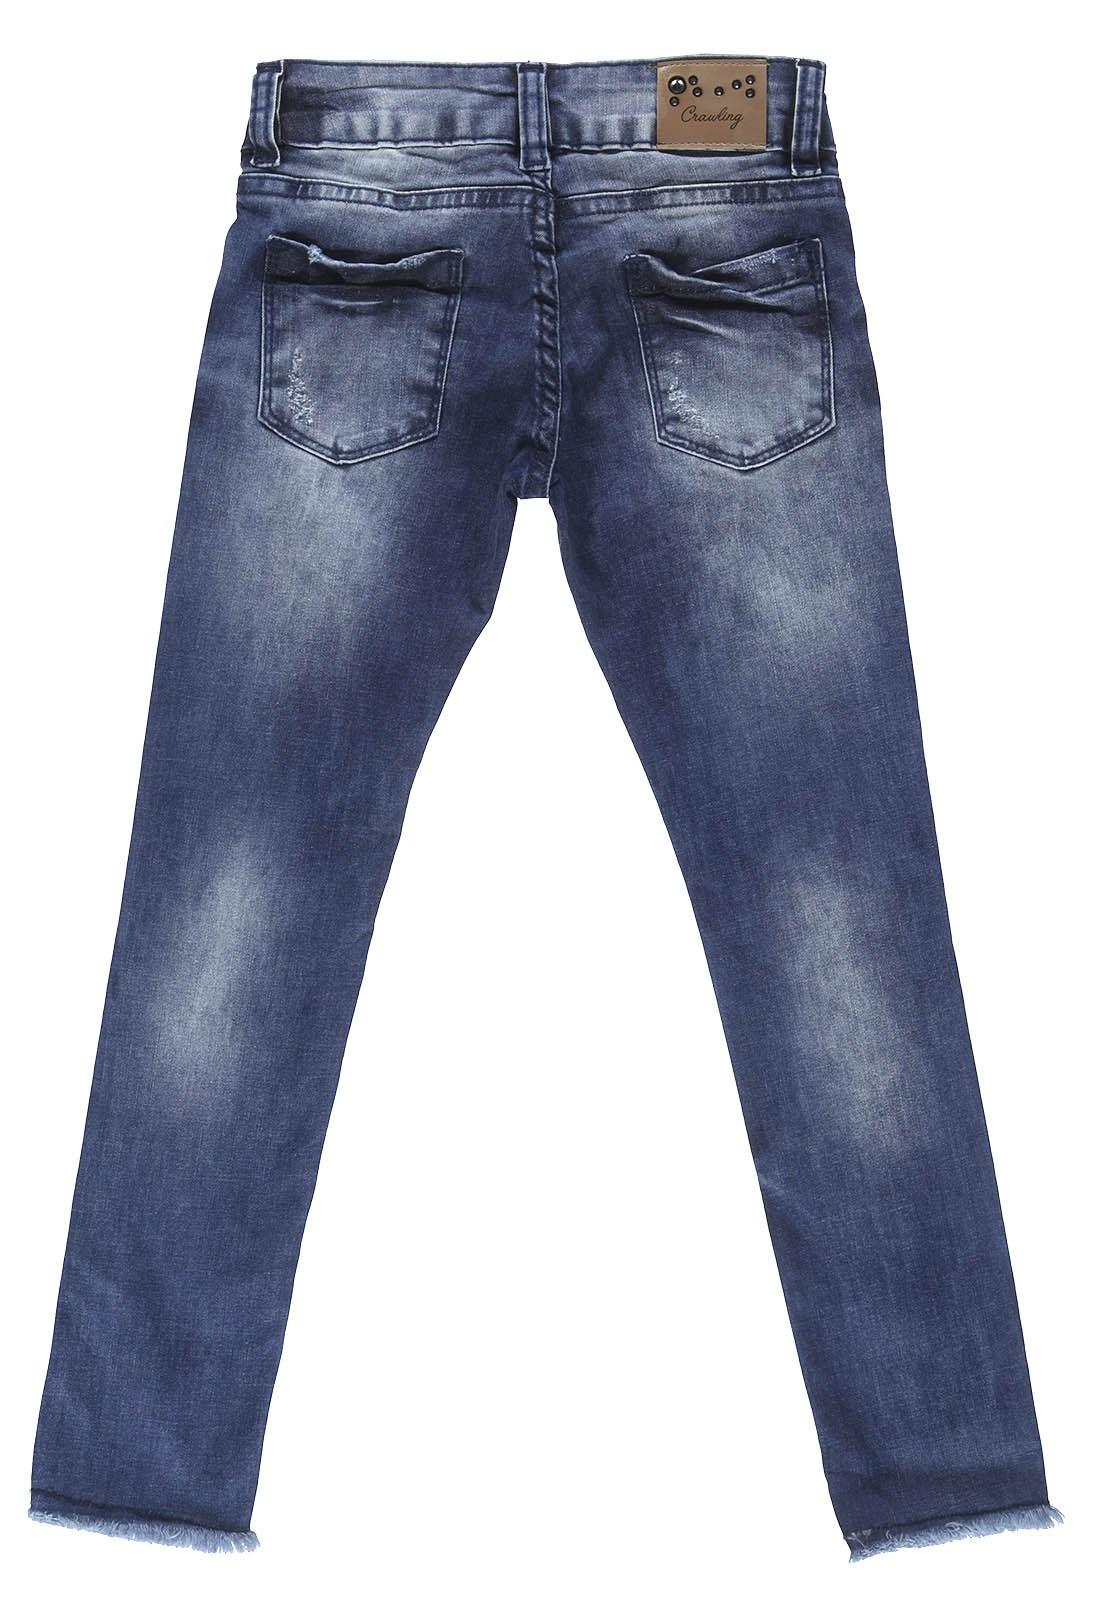 Calça Feminina Jeans Crawling Cropped Azul